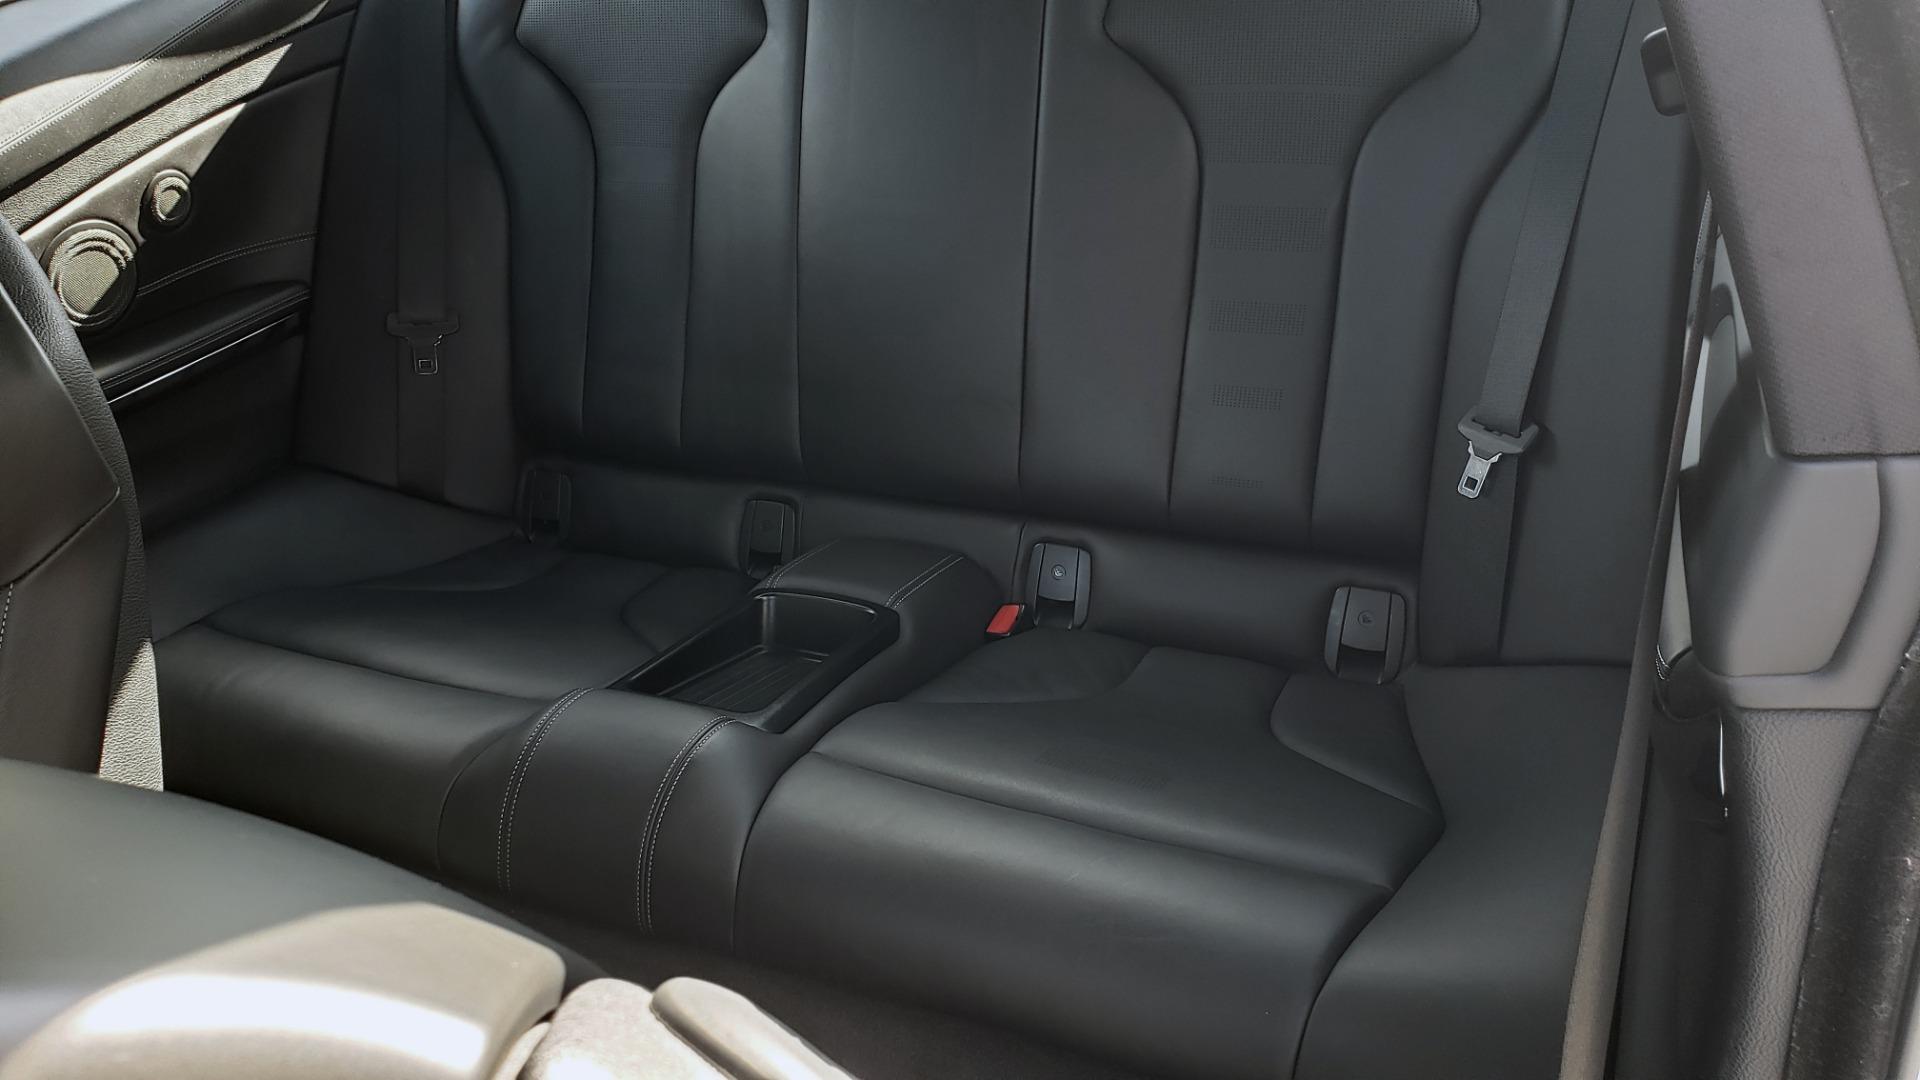 Used 2015 BMW M4 COUPE / EXEC PKG / DRVR ASST PLUS / LIGHTING / M-SUSPENSION for sale Sold at Formula Imports in Charlotte NC 28227 69